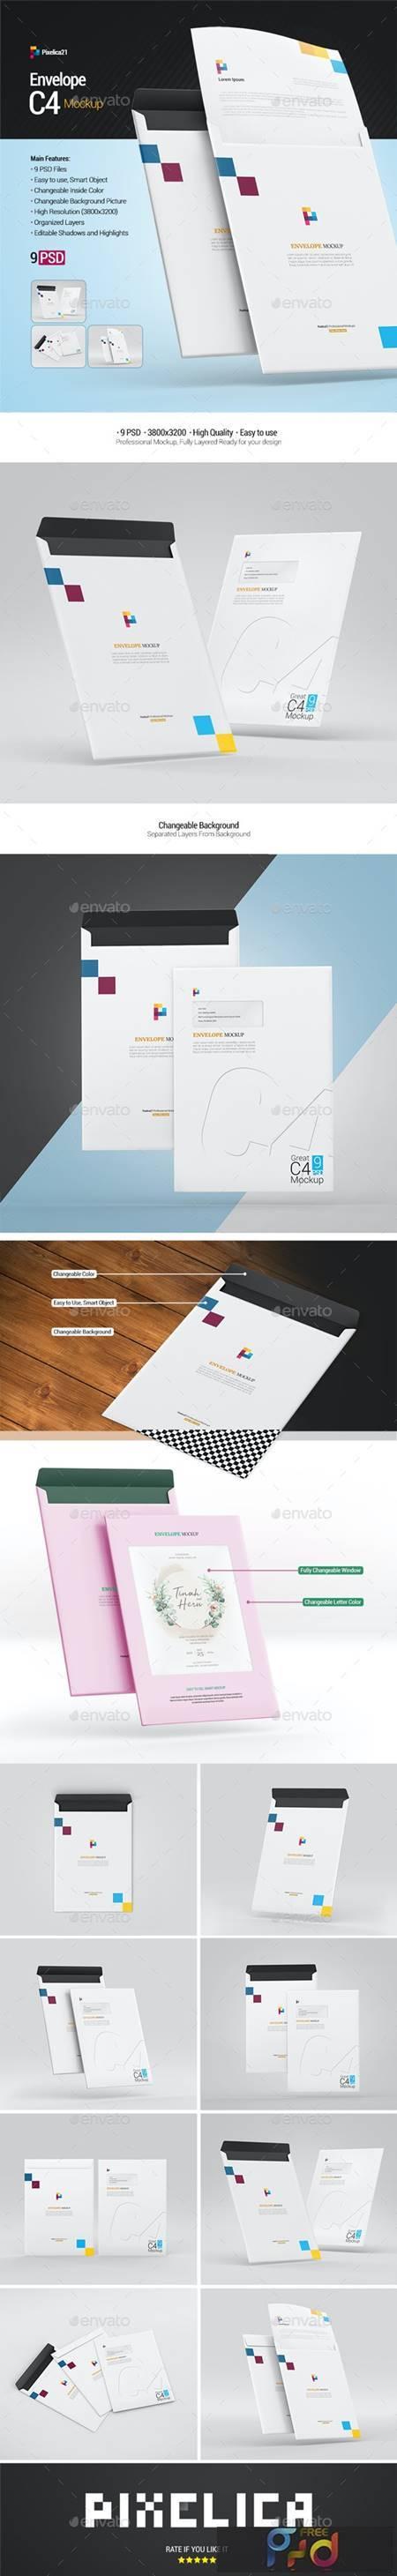 Envelope C4 Mockup 29311897 1